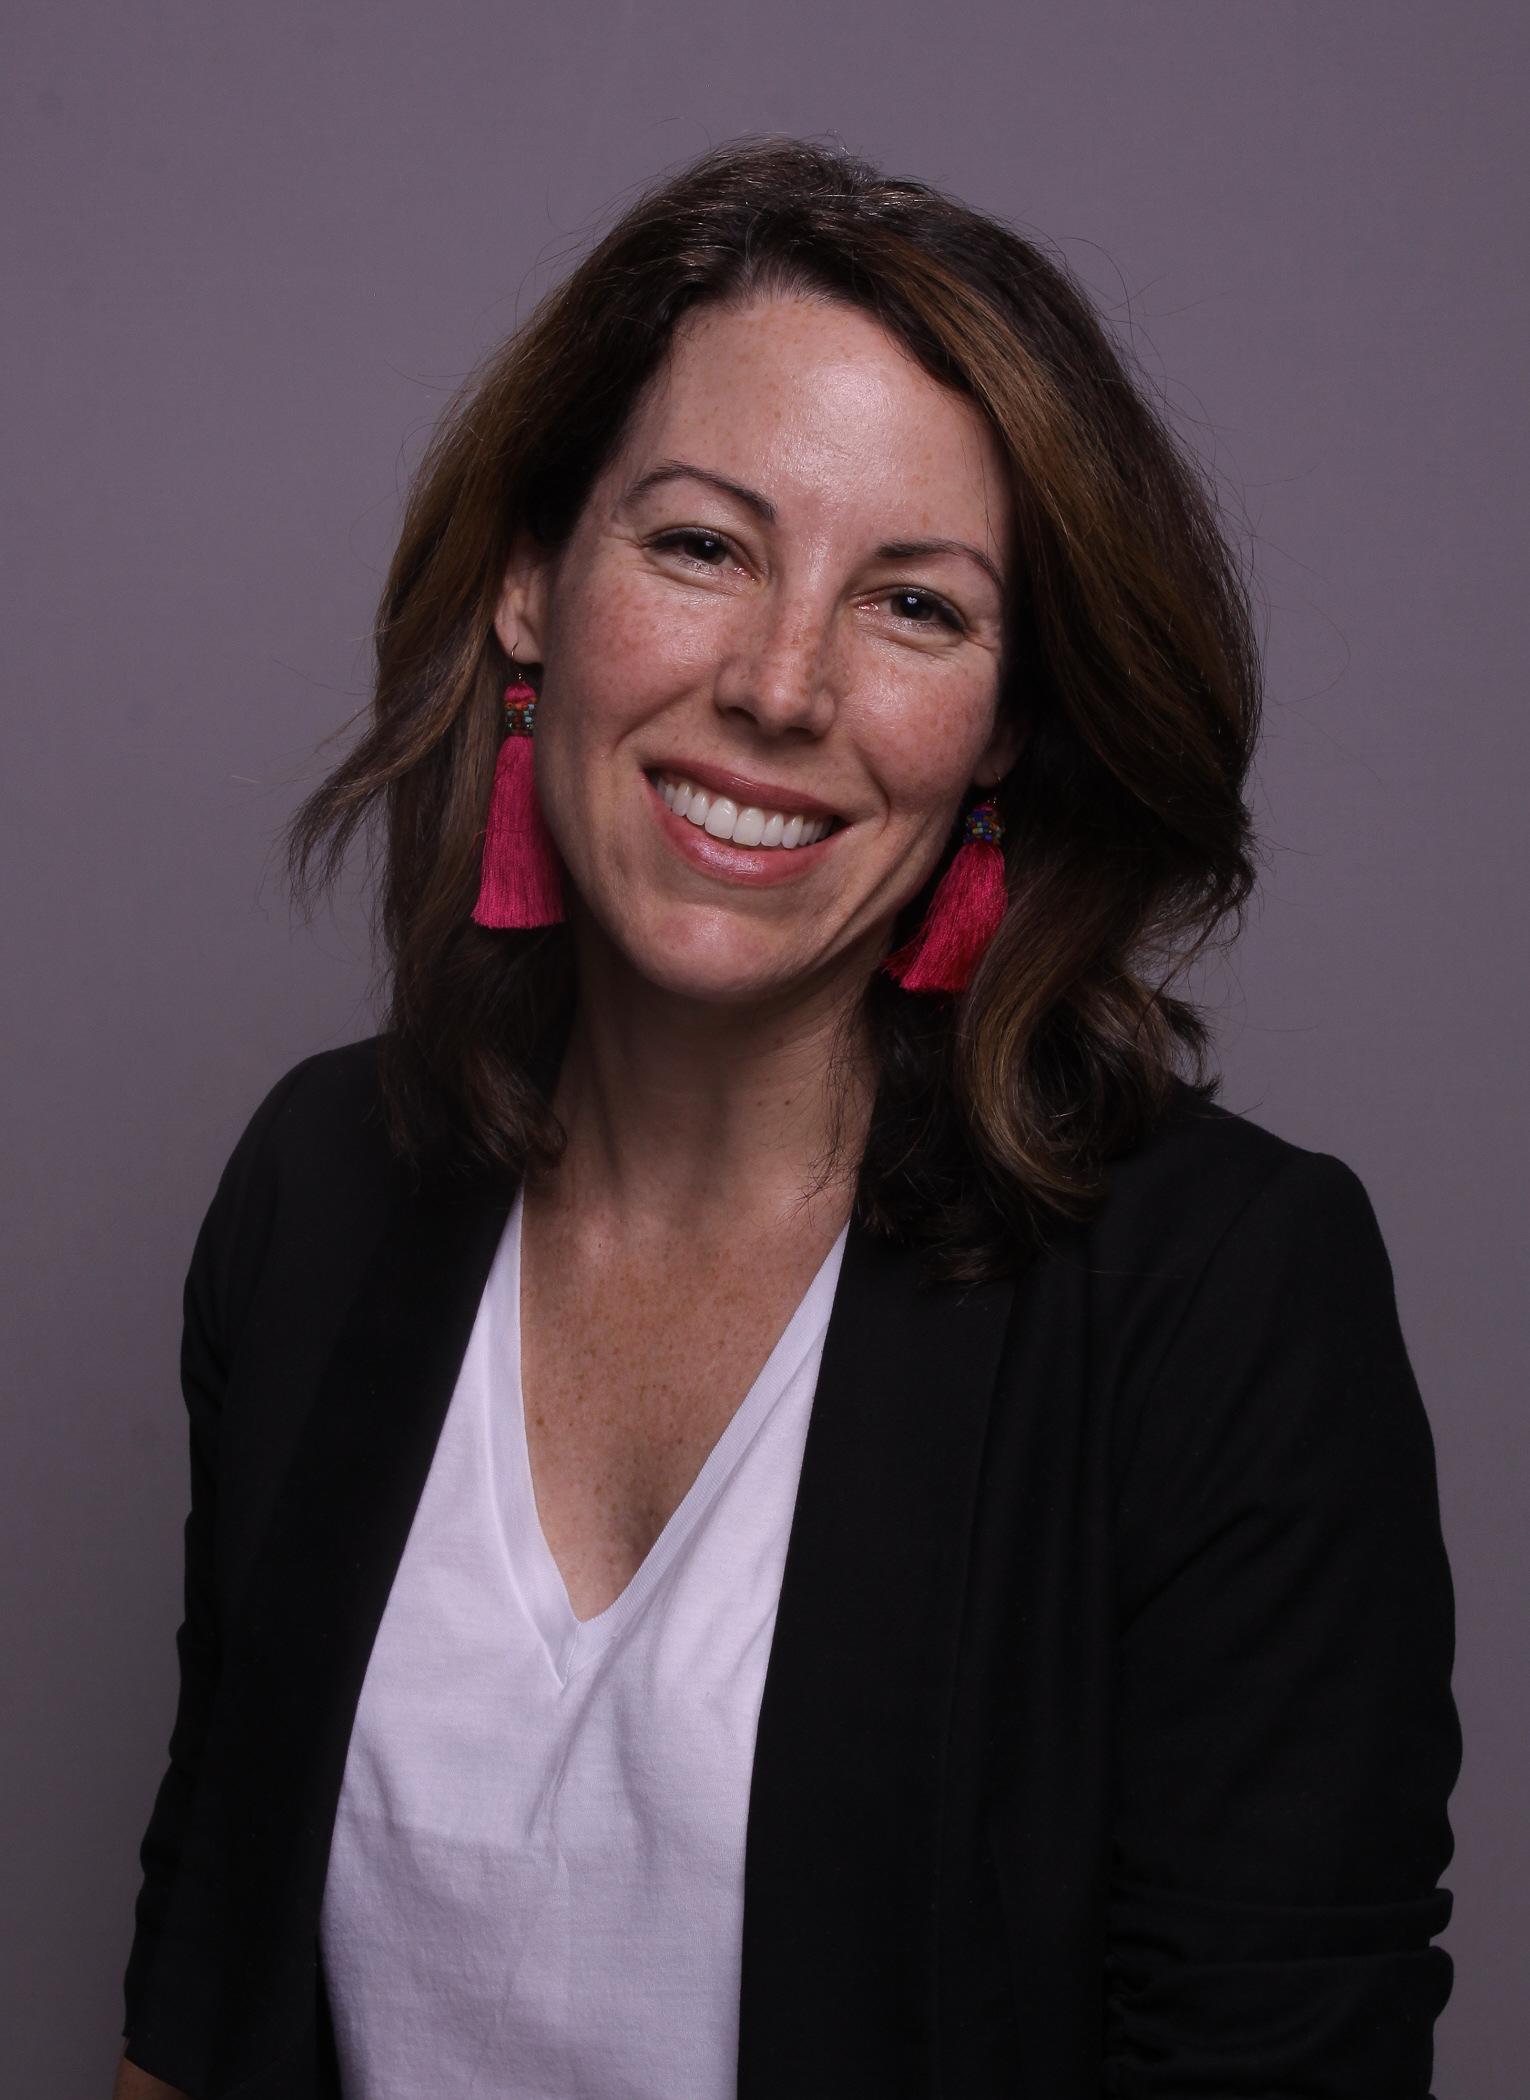 CARRIE NIEMAN CULPEPPER, Consultant